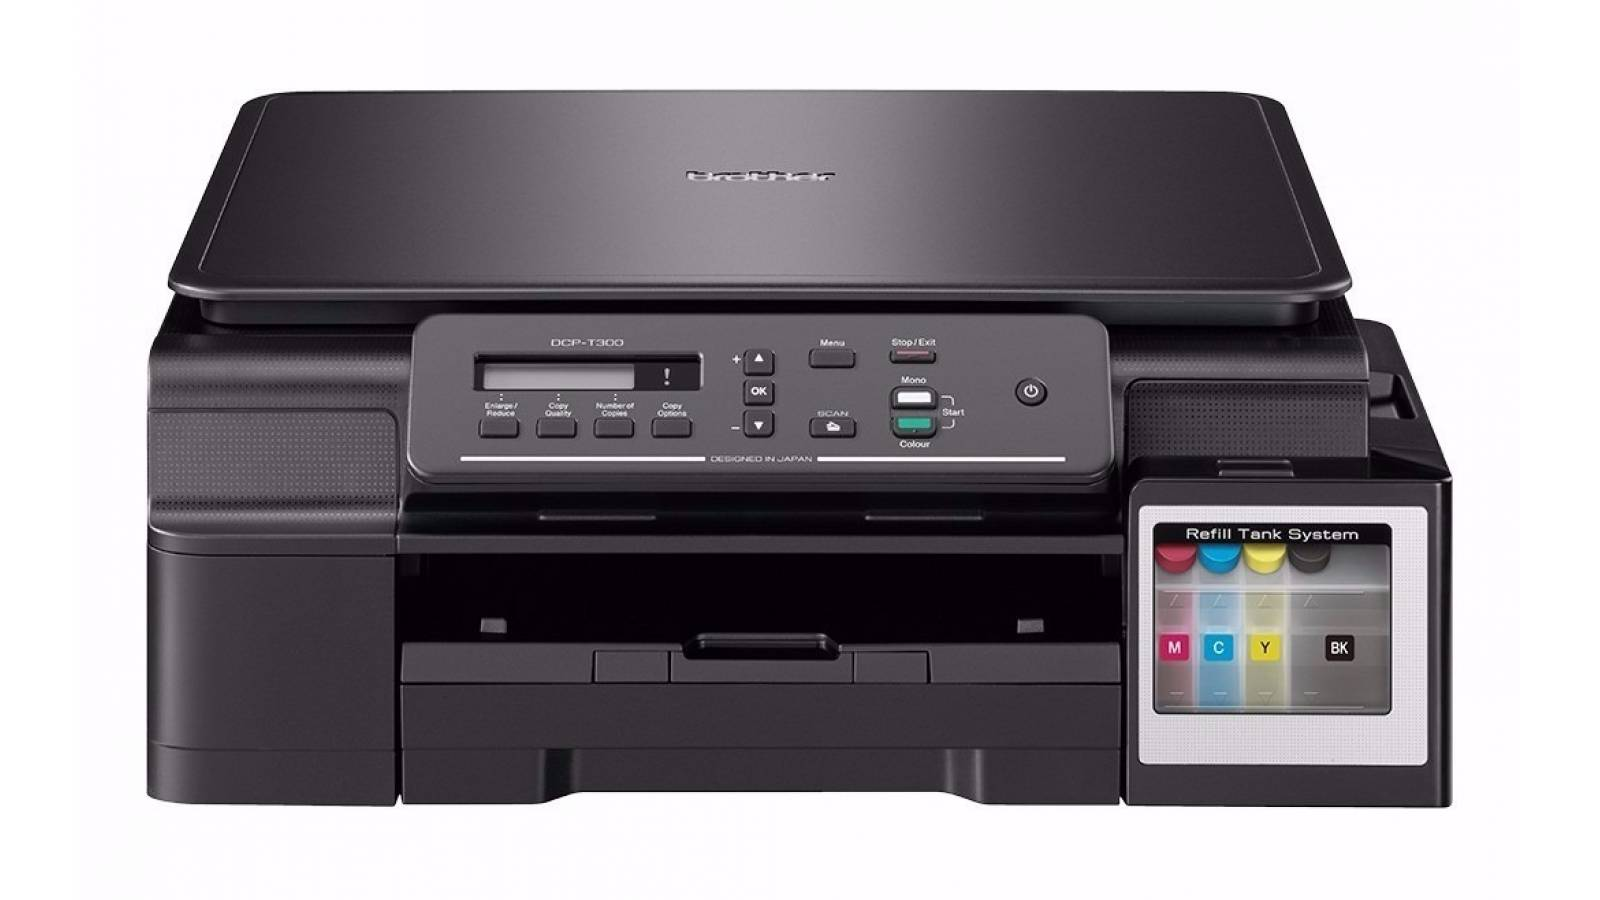 Impresora inkjet color multifuncional Brother DCP-T300 con sistema continuo